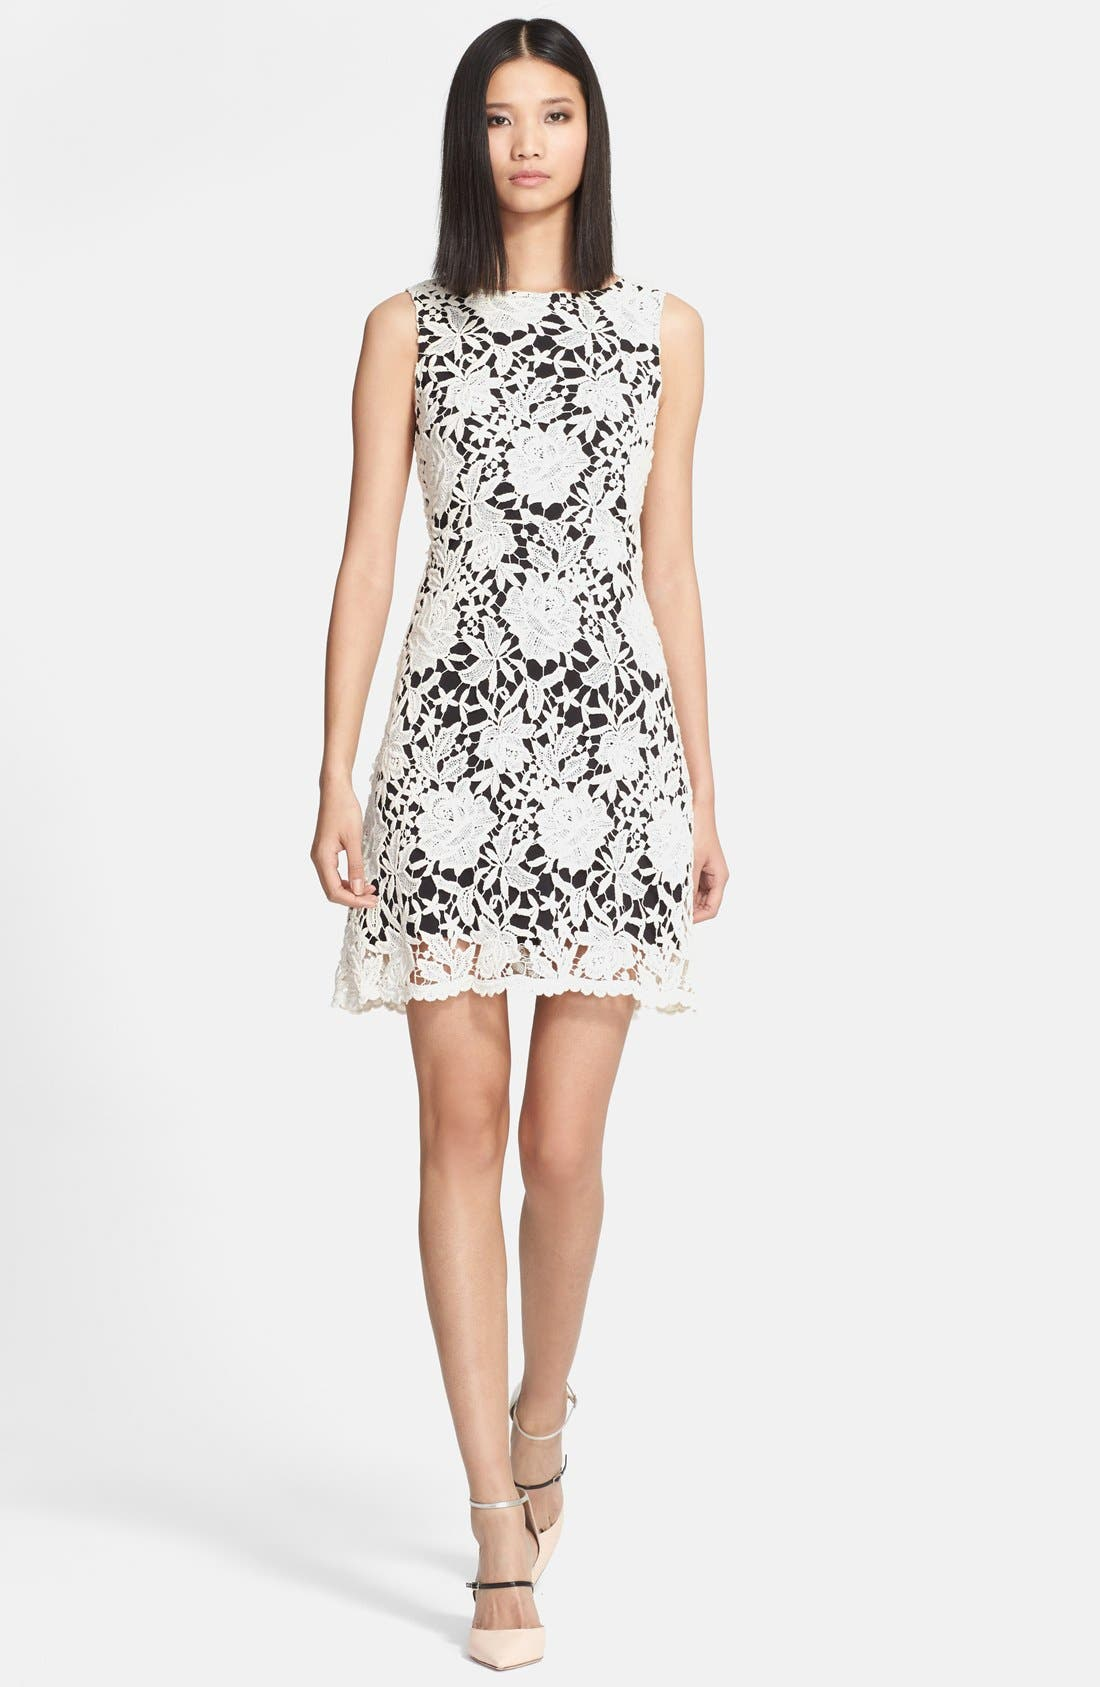 Alternate Image 1 Selected - Alice + Olivia 'Jolie' Cotton Lace Dress